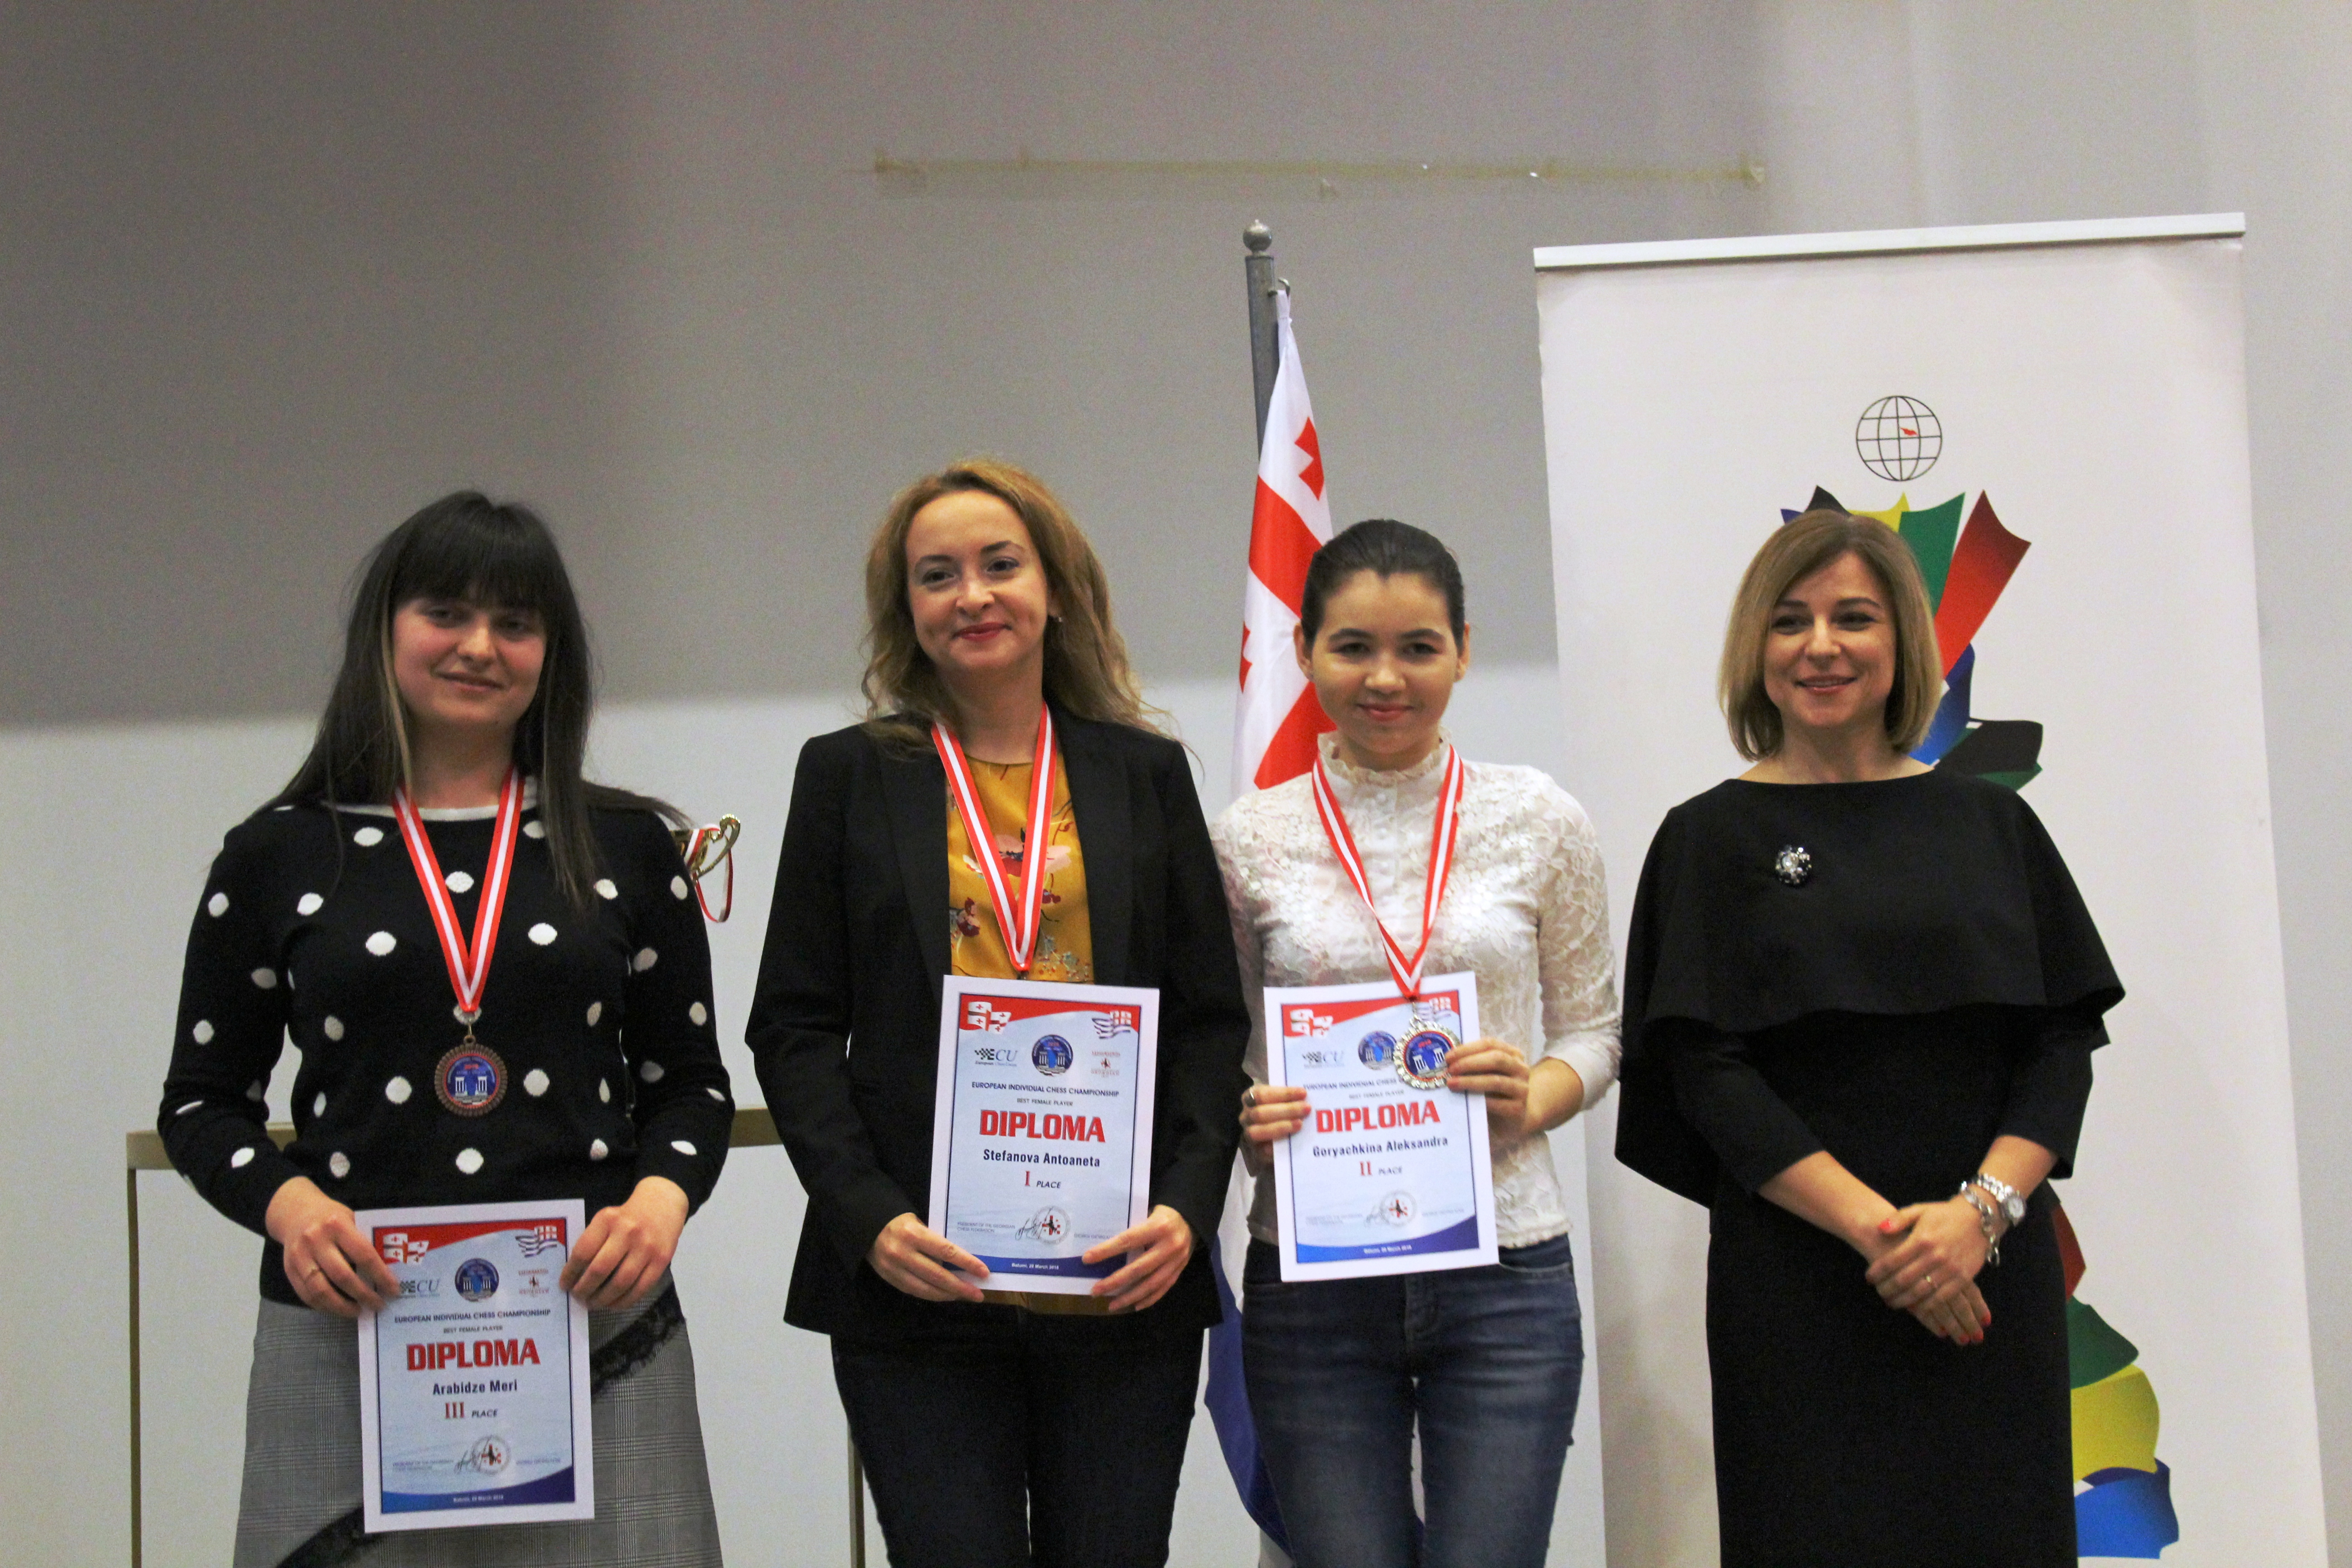 Stefanova Antoaneta, Goryachkina Aleksandra, Arabidze Meri at the 2018 European Championship